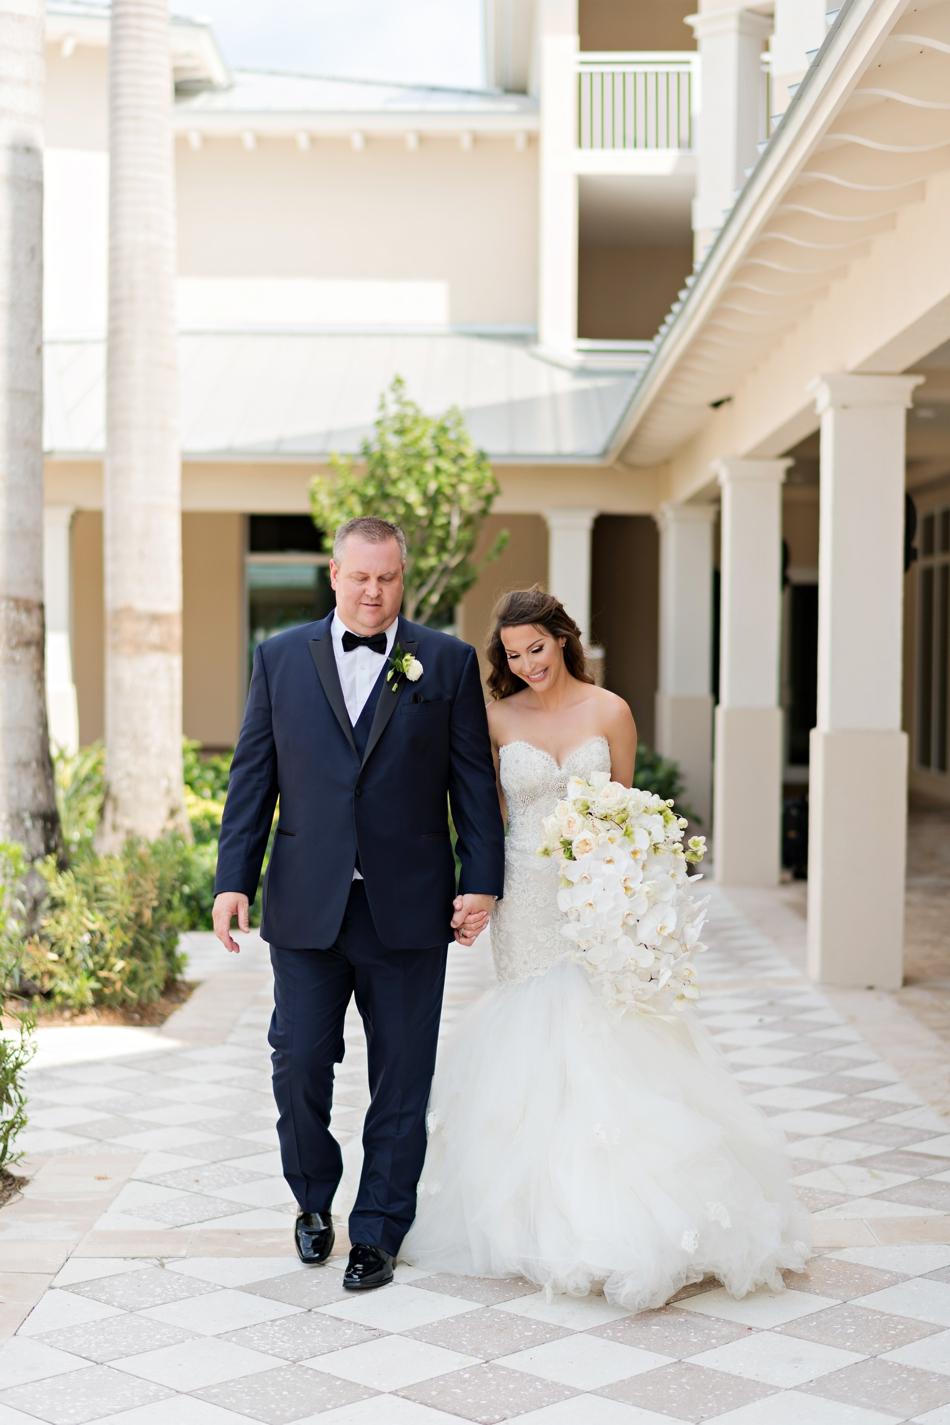 Destination UK Wedding In Key Largo Florida